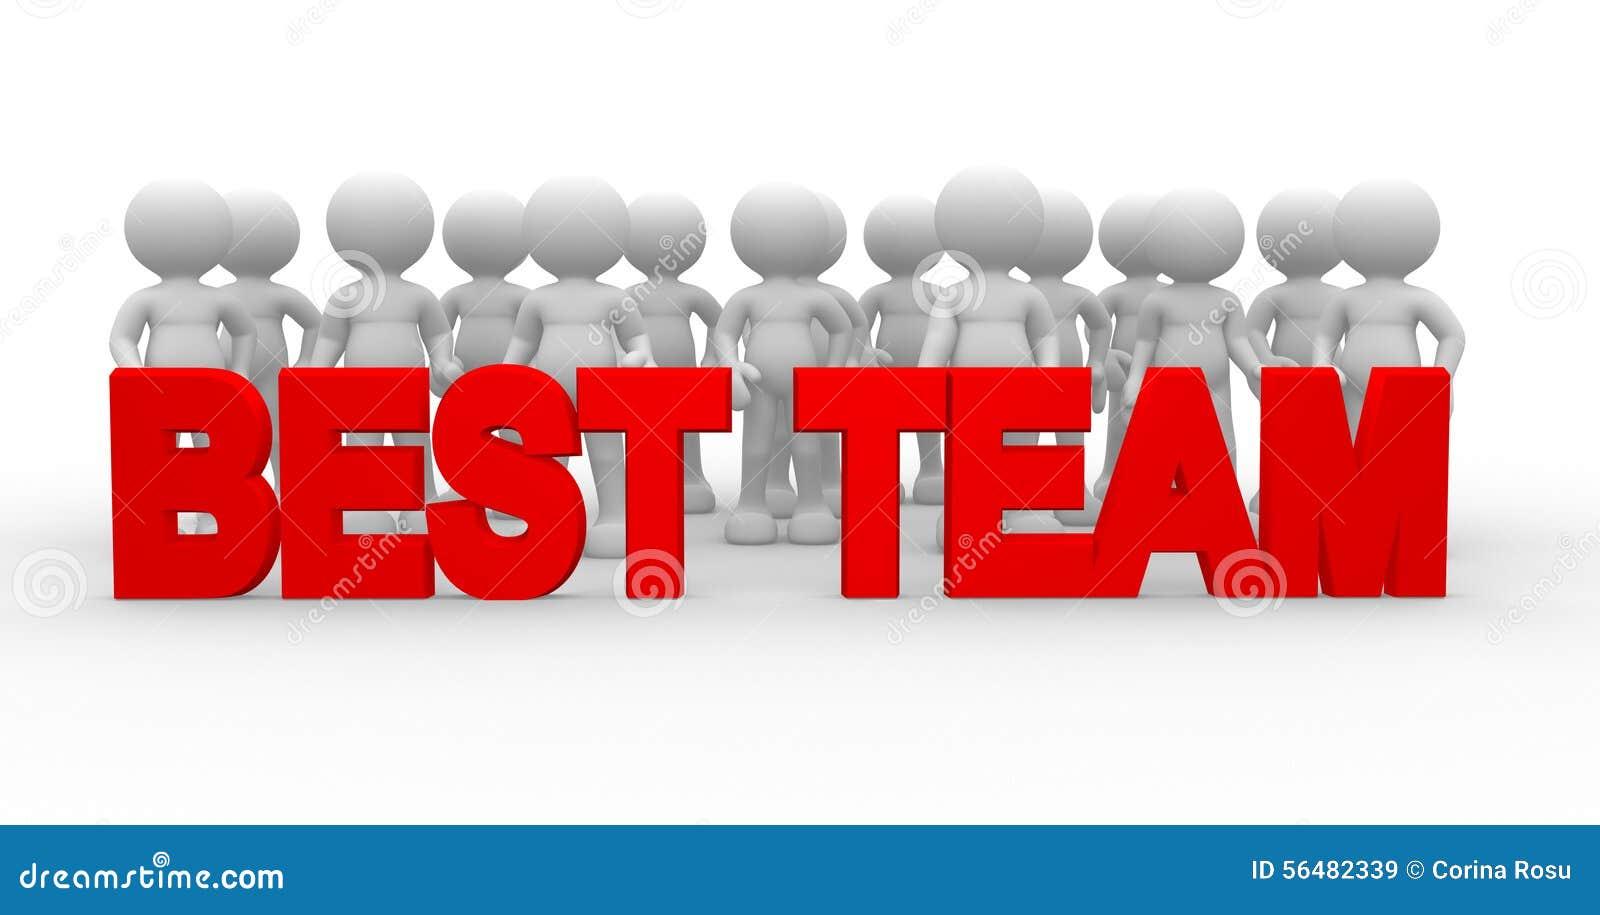 Best team stock illustration illustration of friendship for Top best images